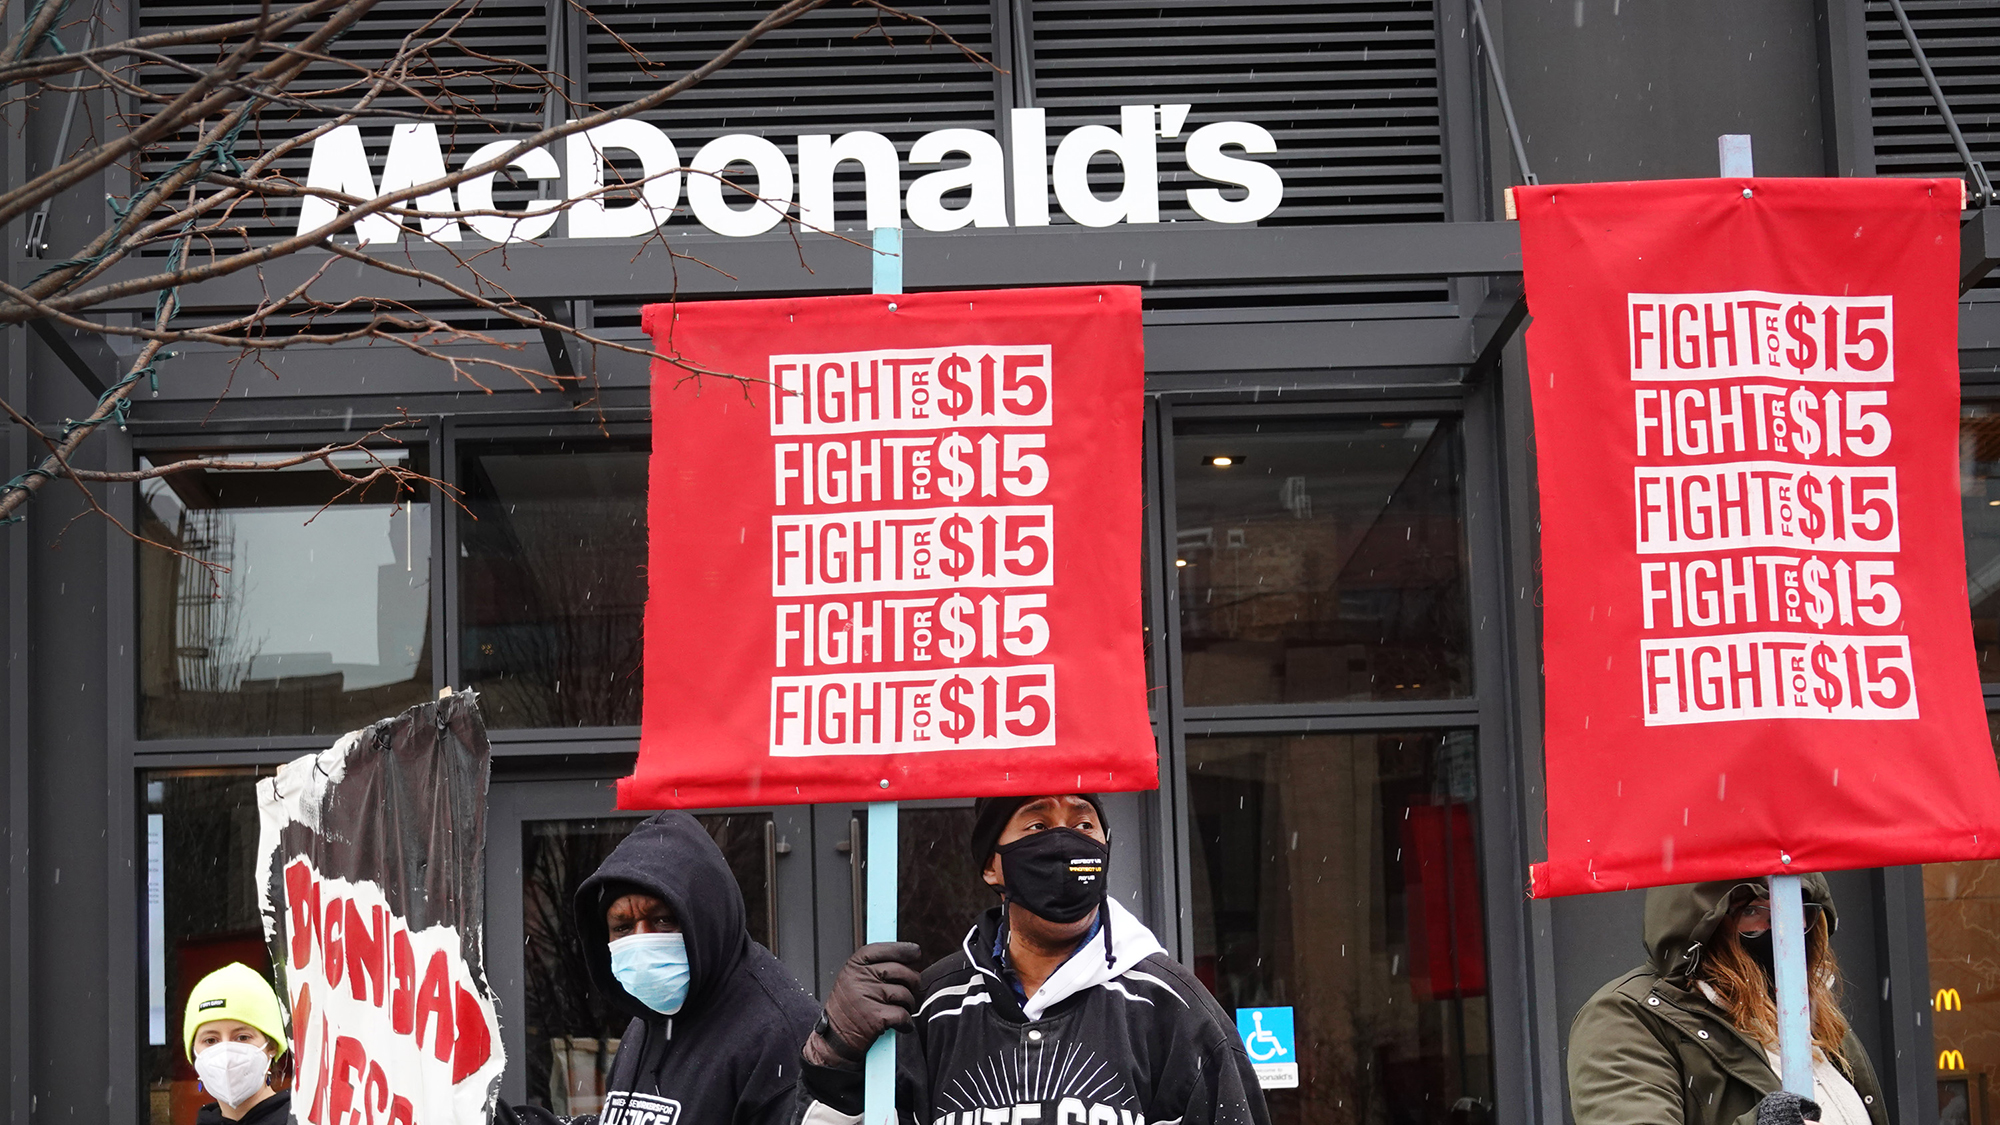 Fight for $15 minimum wage heats up after Biden's endorsement